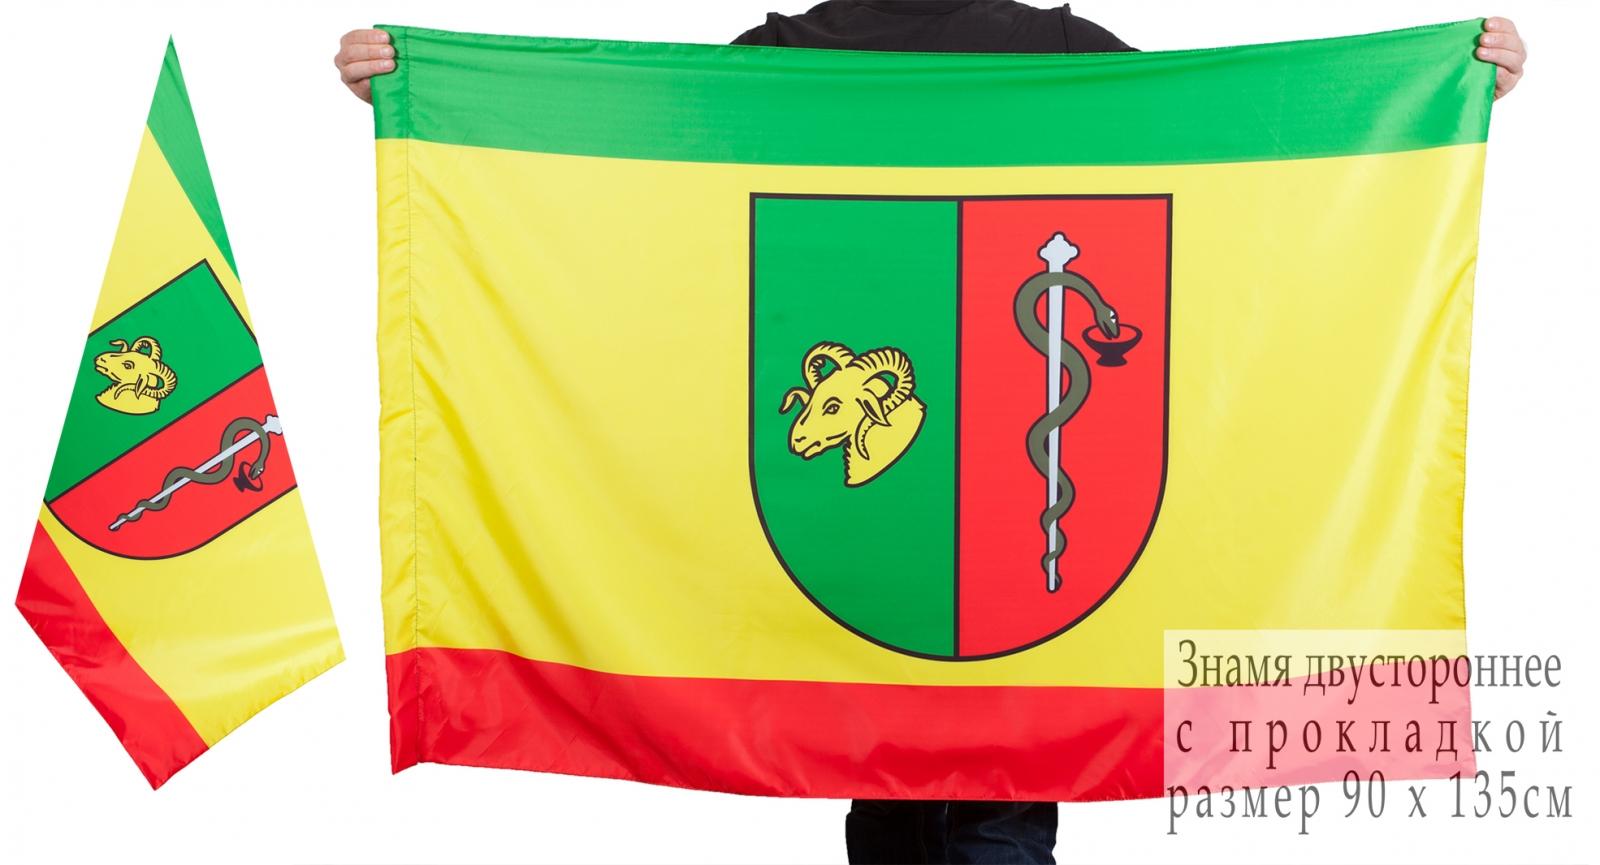 Двухсторонний флаг Евпатории